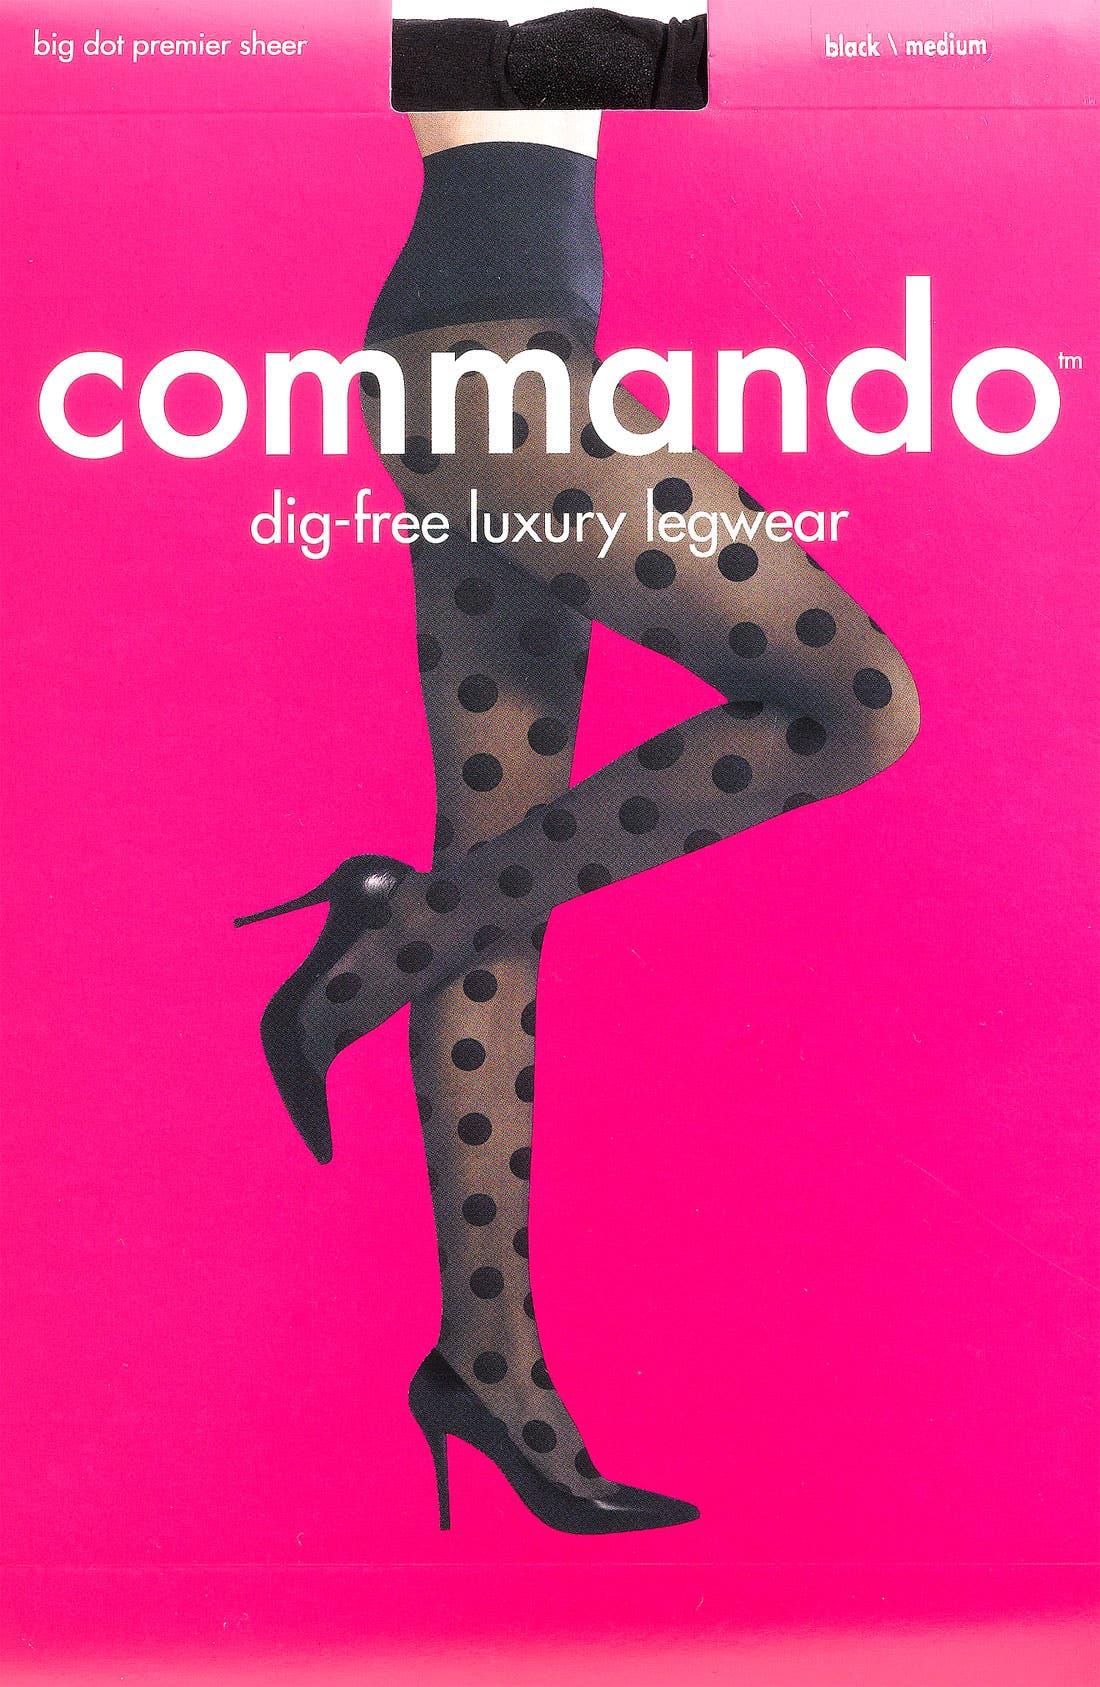 Alternate Image 2  - Commando 'Big Dot' Sheer Tights